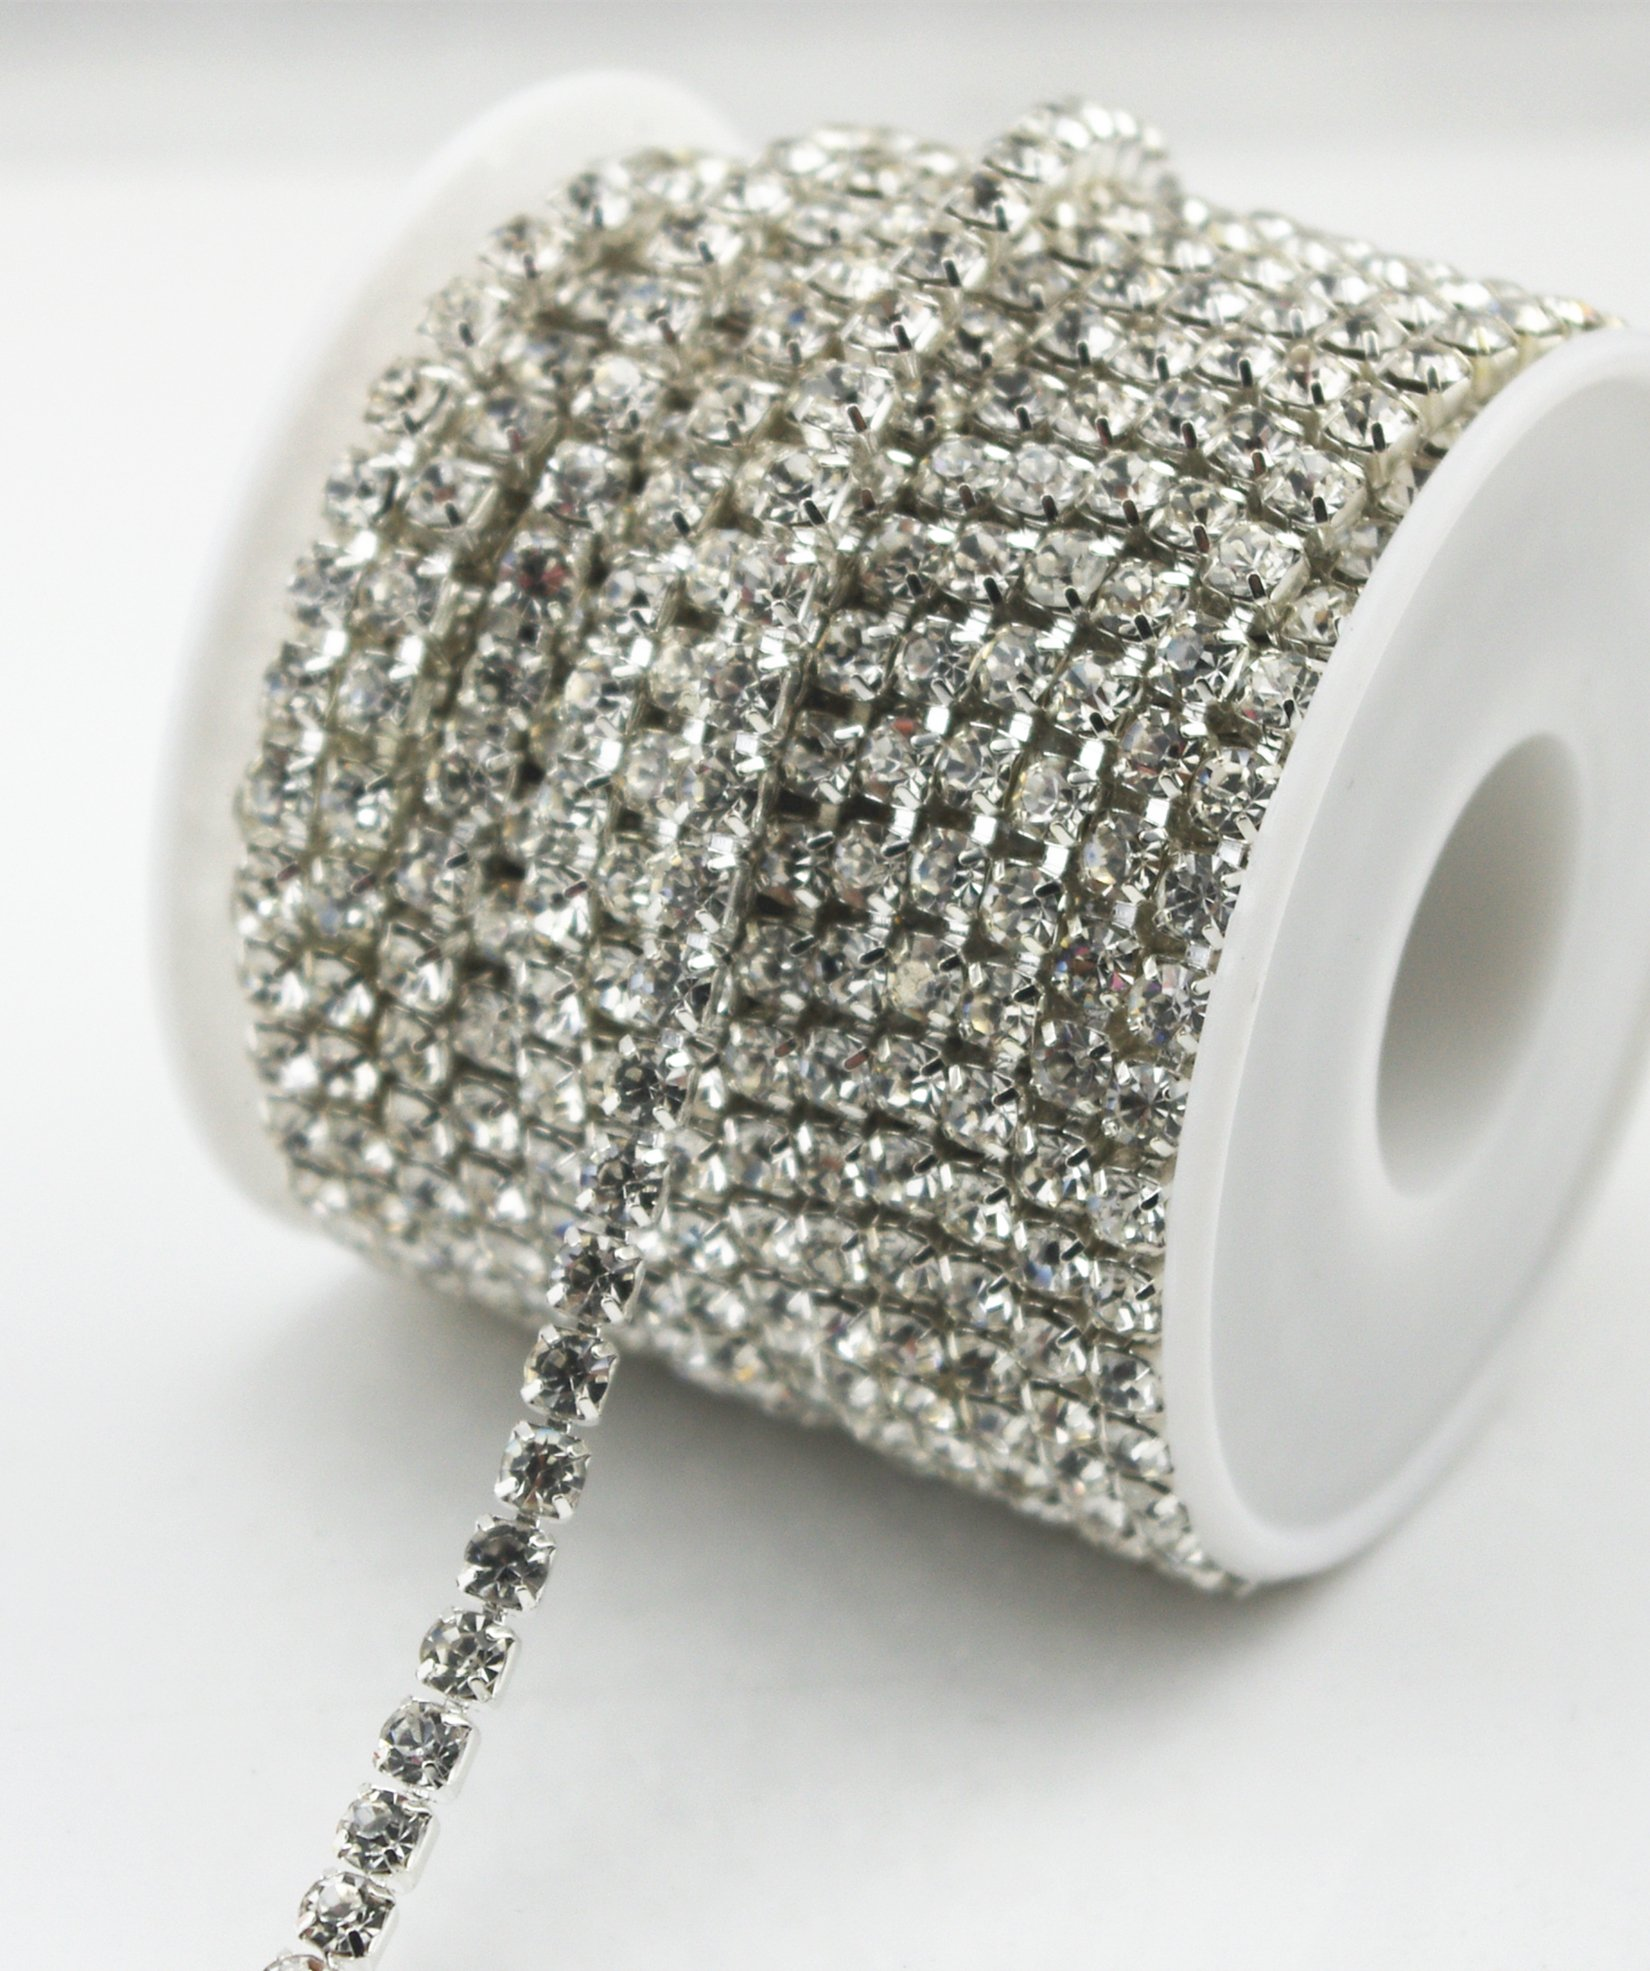 1 row 2 rows 3-rows 4-rows 5-rows 6 rows crystal rhinestone trims close silver chain Costume Applique Sew On Rhinestone Wedding Dress Decoration ss16 (3 ROWS)